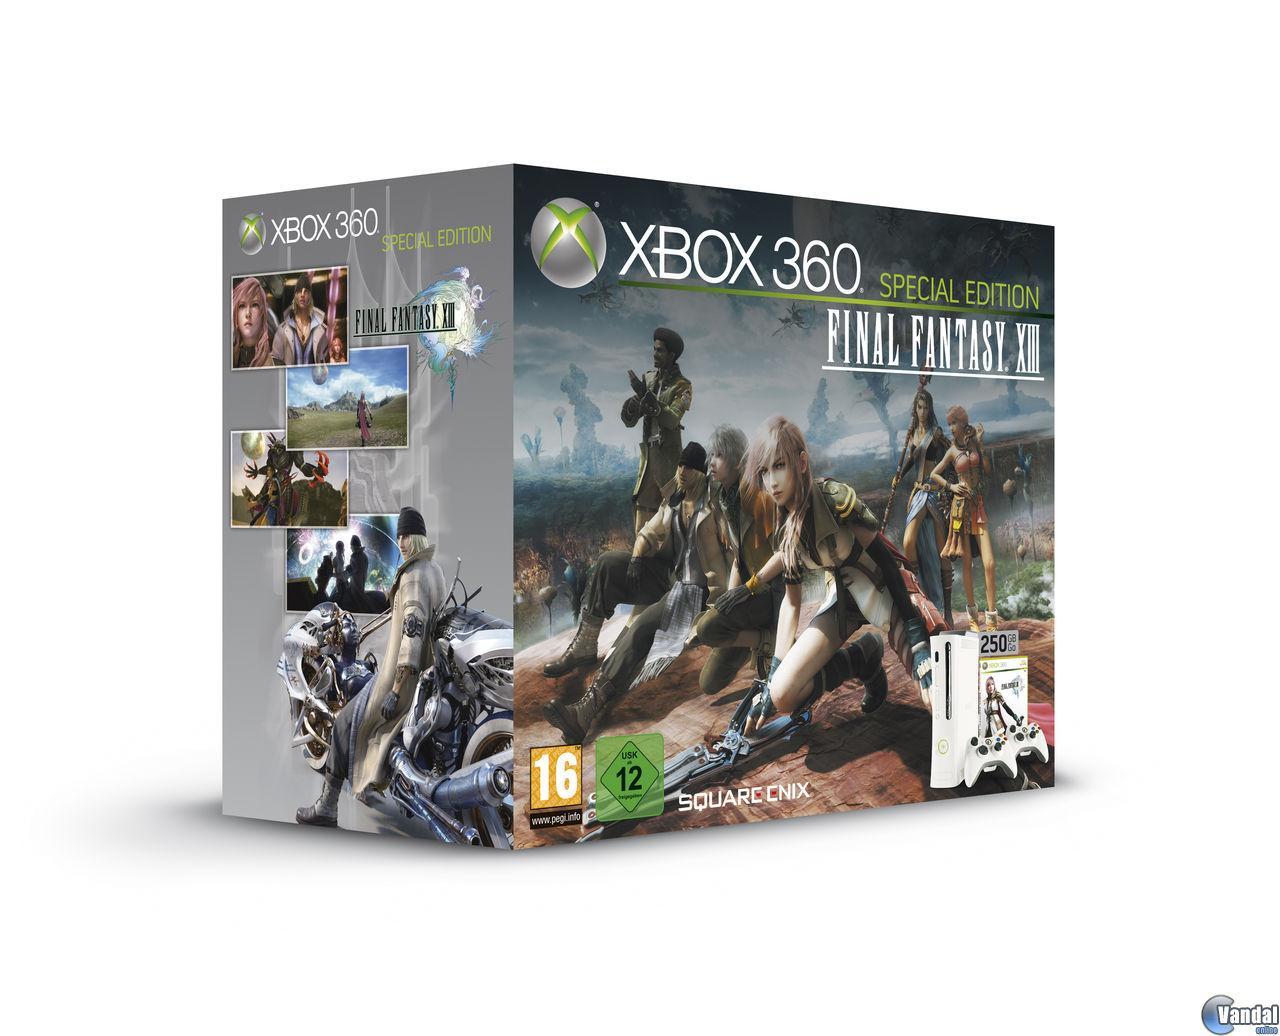 FINAL FANTASY XIII  [PS3 : Xbox360] 2010212161542_1